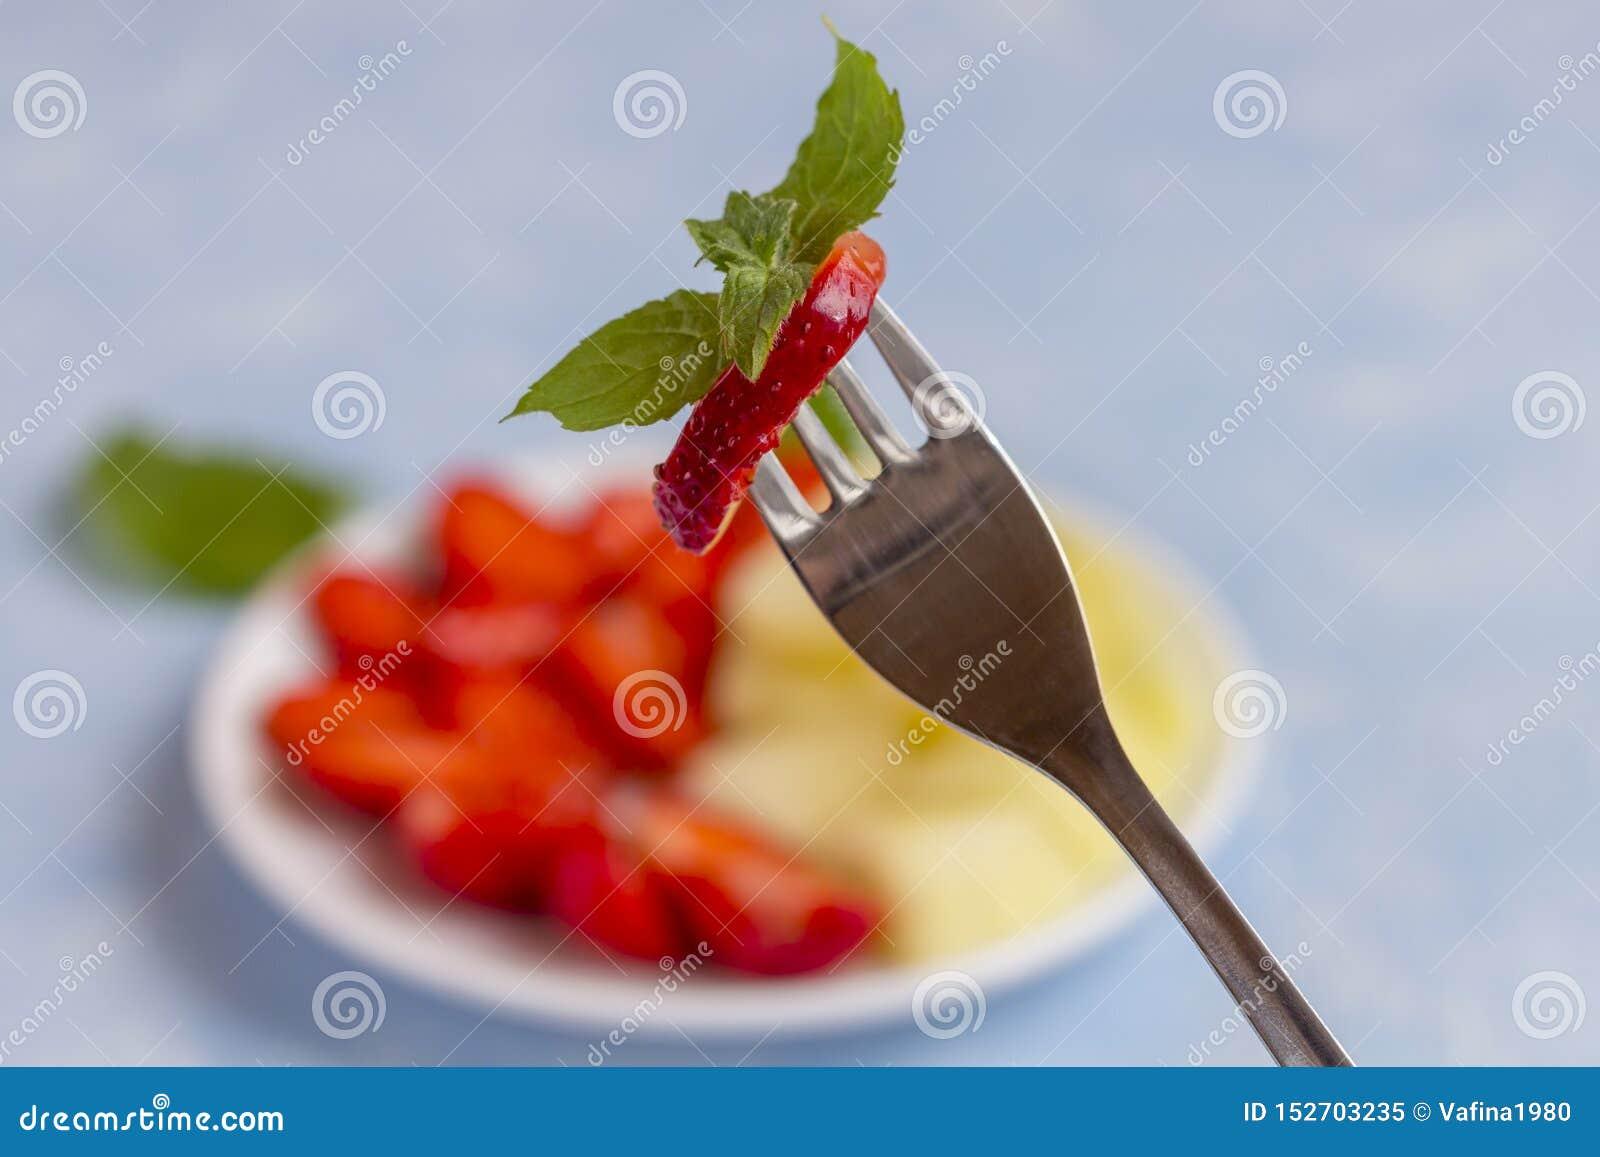 Berry on a fork close up. Fresh Organic Vegetarian Fruit Salad